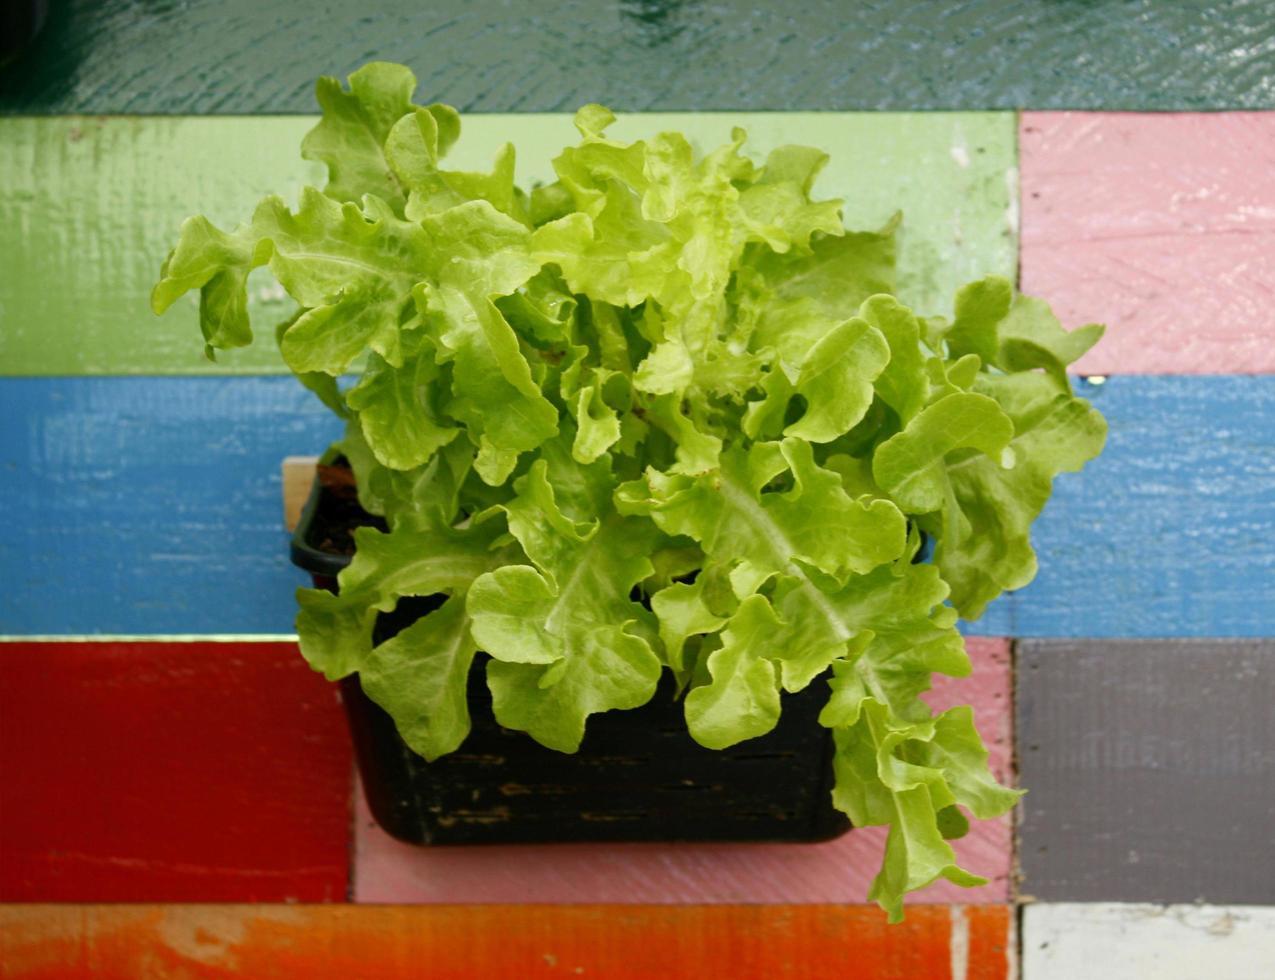 plante verte en pot photo